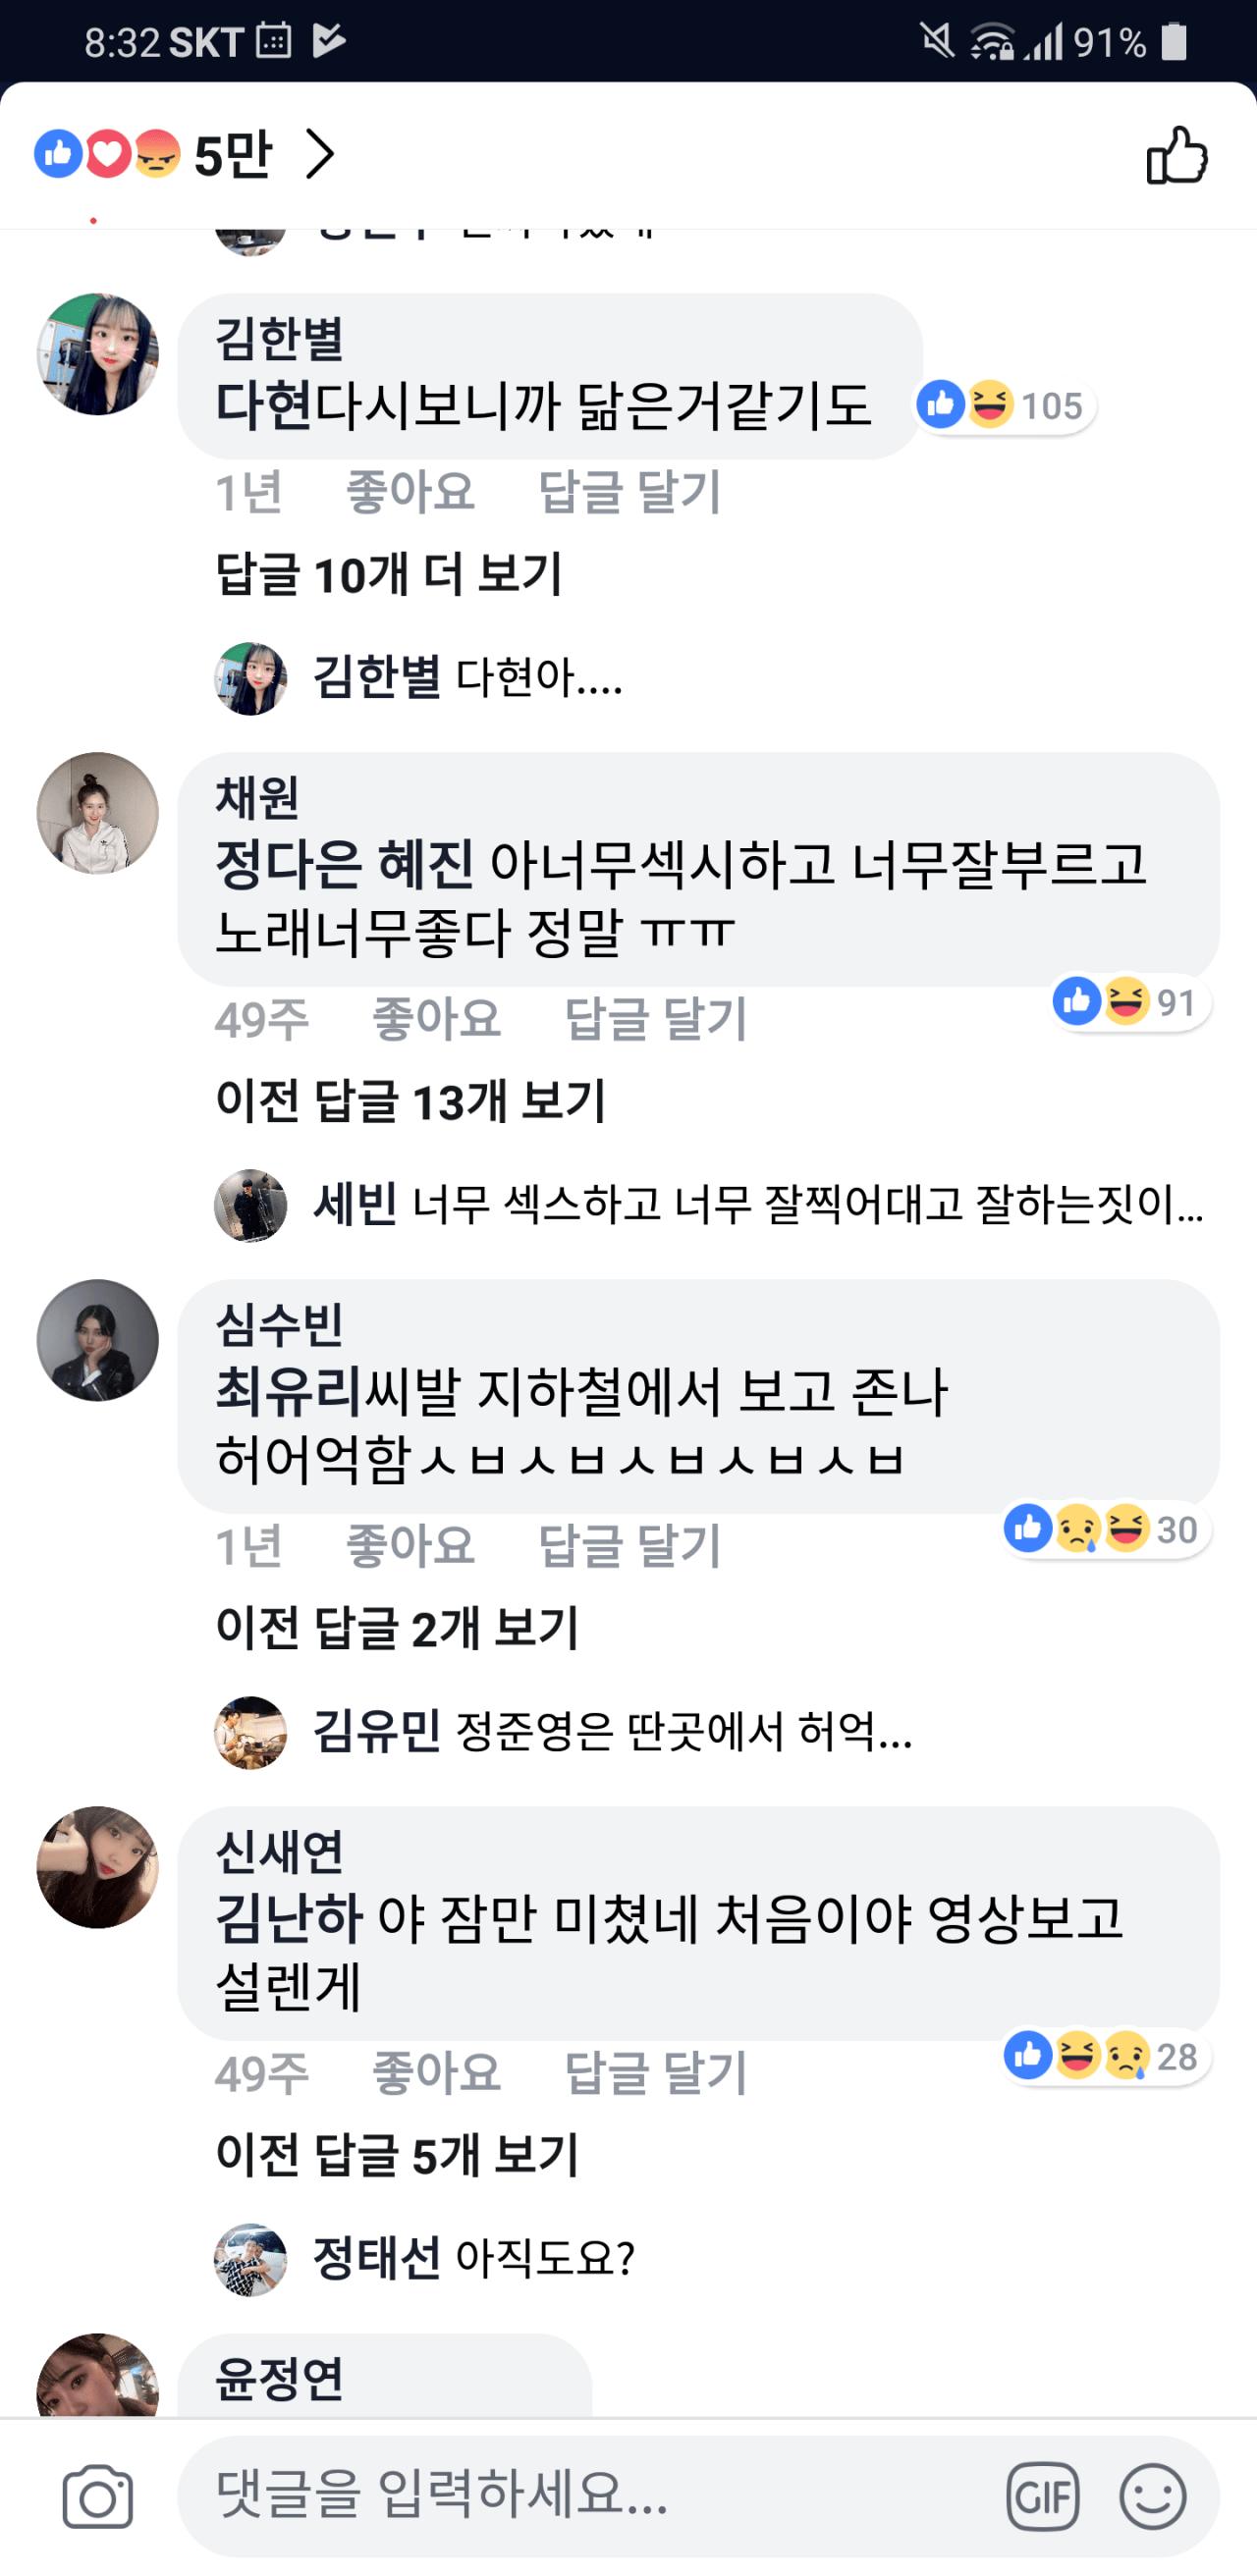 Capture+_2019-03-16-08-32-24.png 정준영 팬들 근황